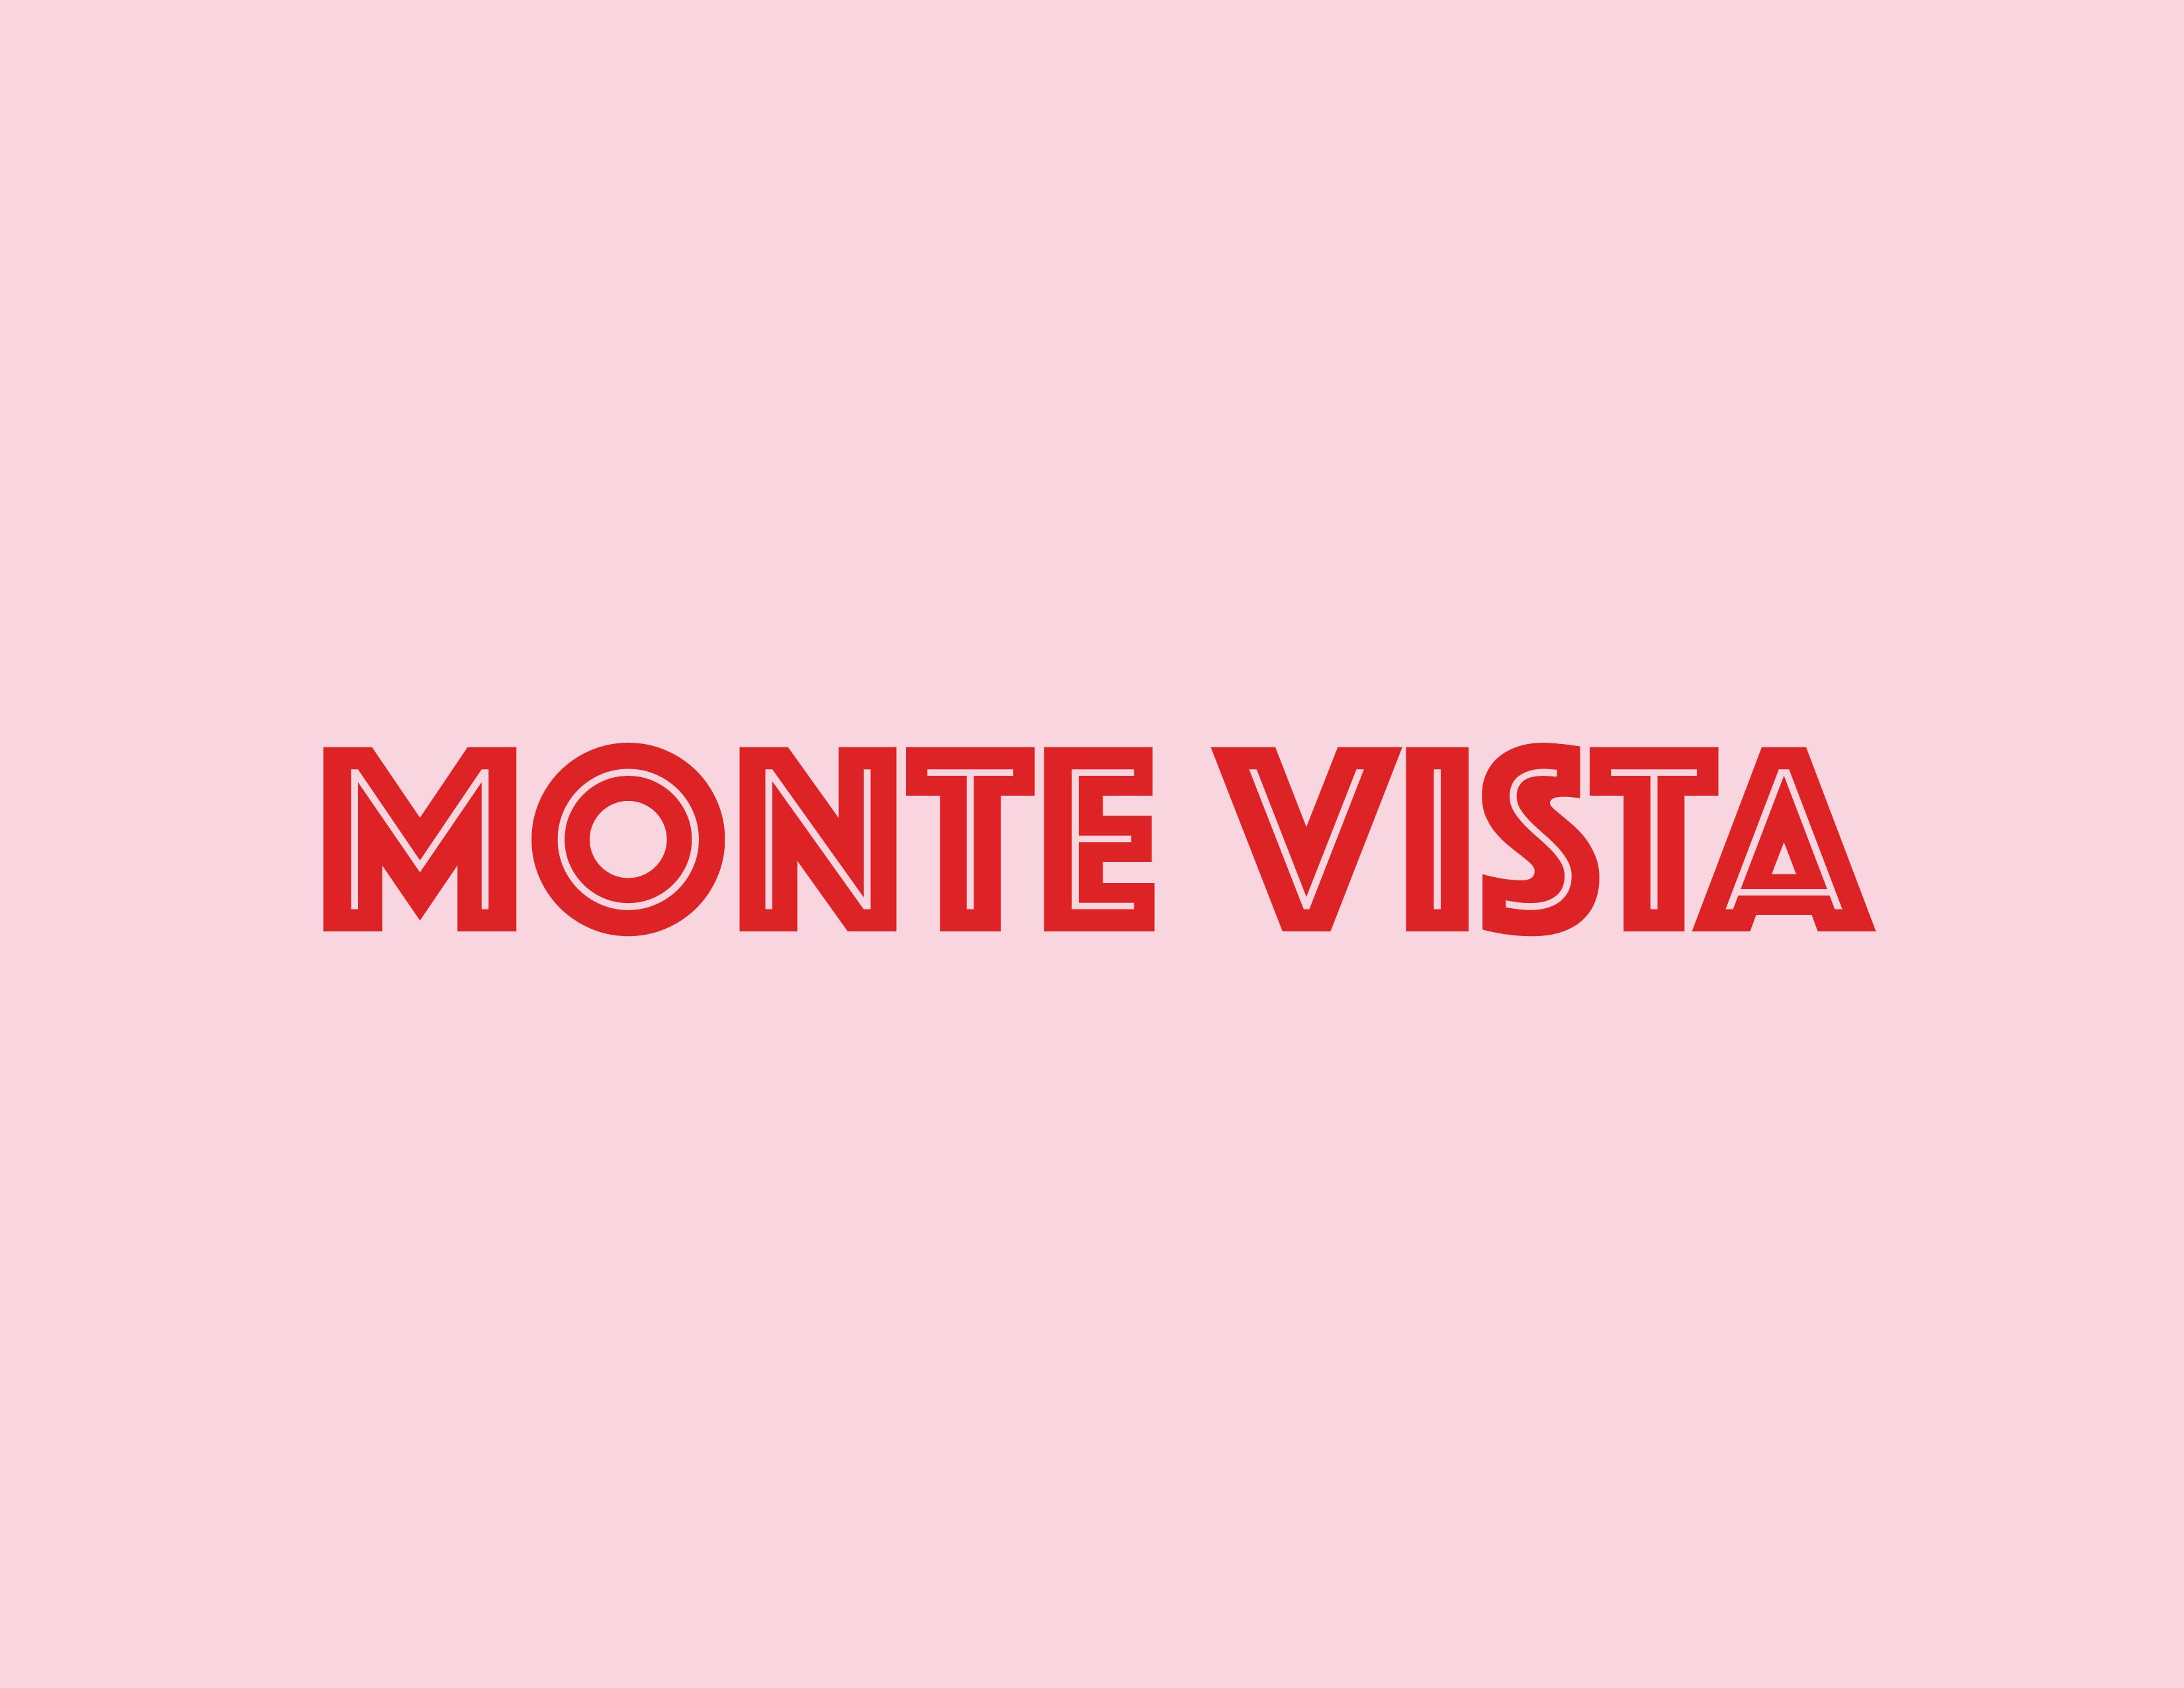 1_brandpad_template_hotel_monte_vista_logo-01